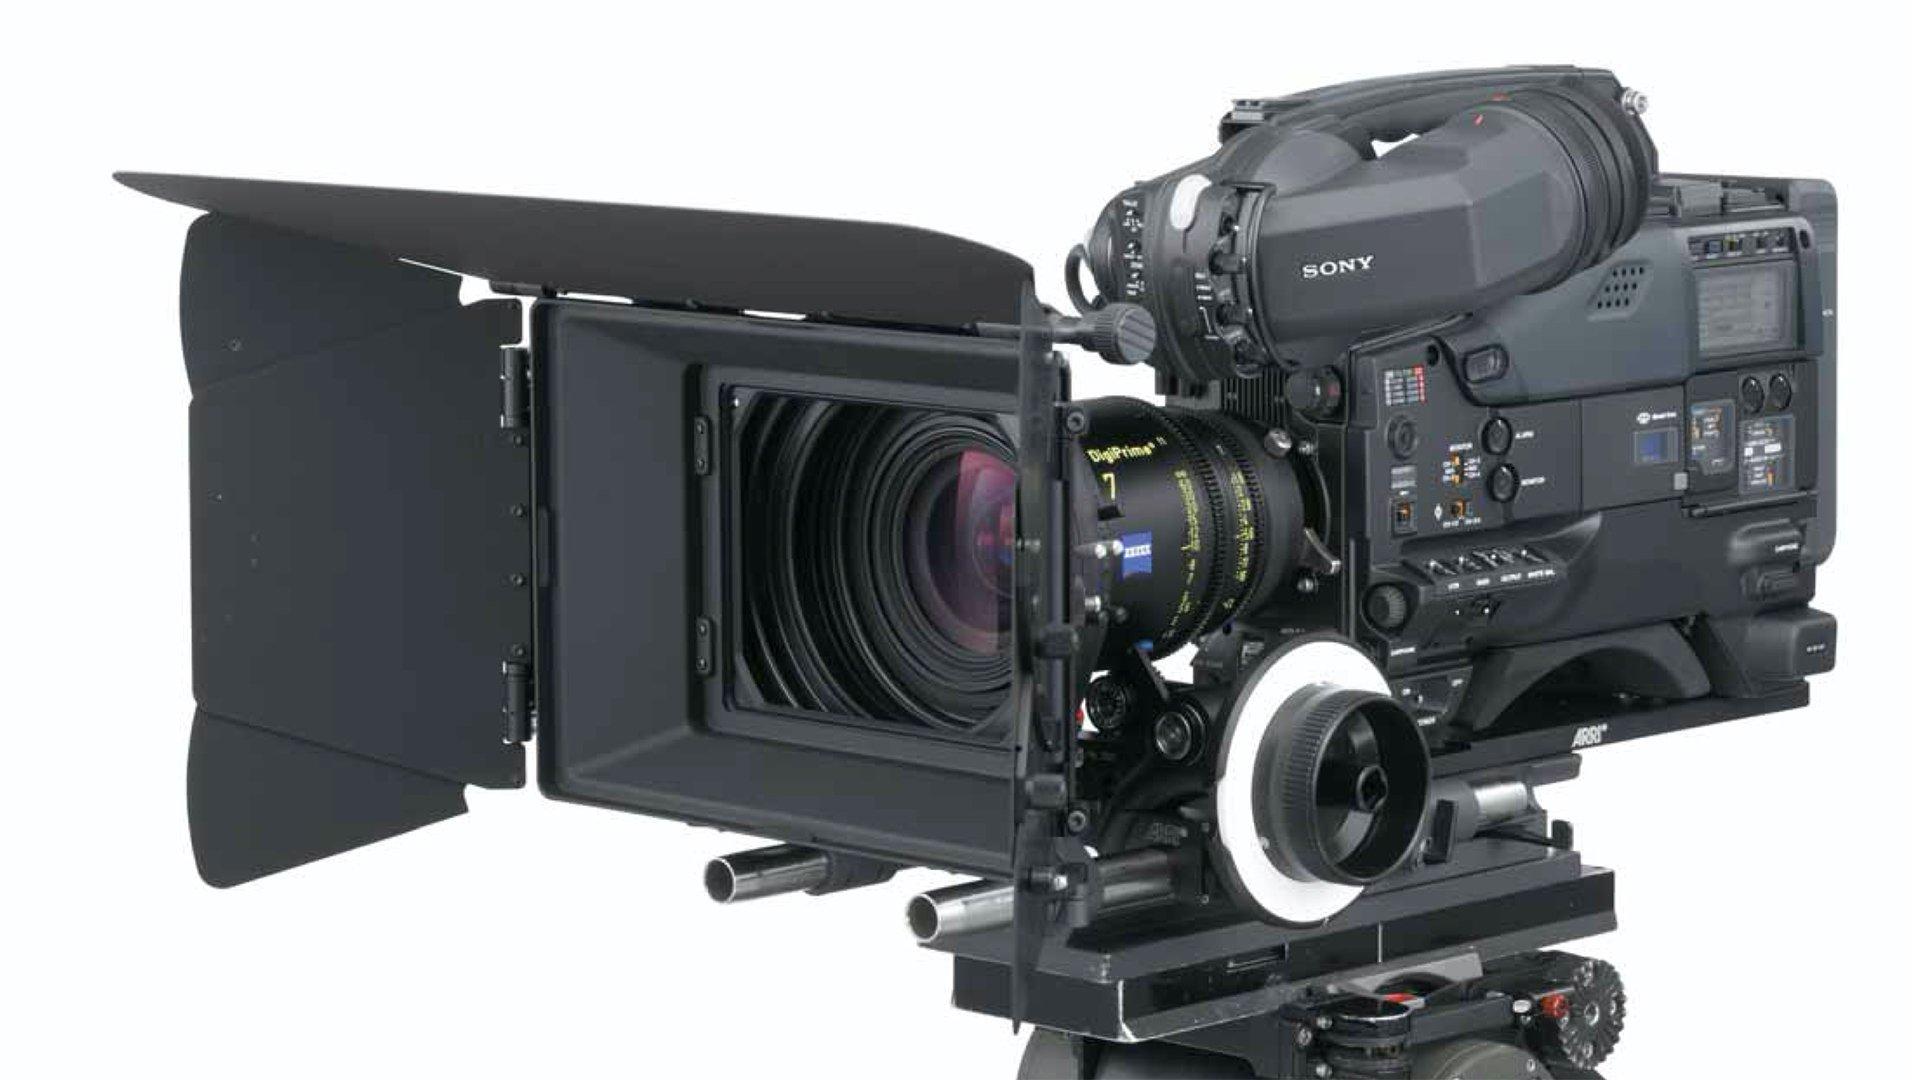 Sony HDW-F900R HDCAM camcorder